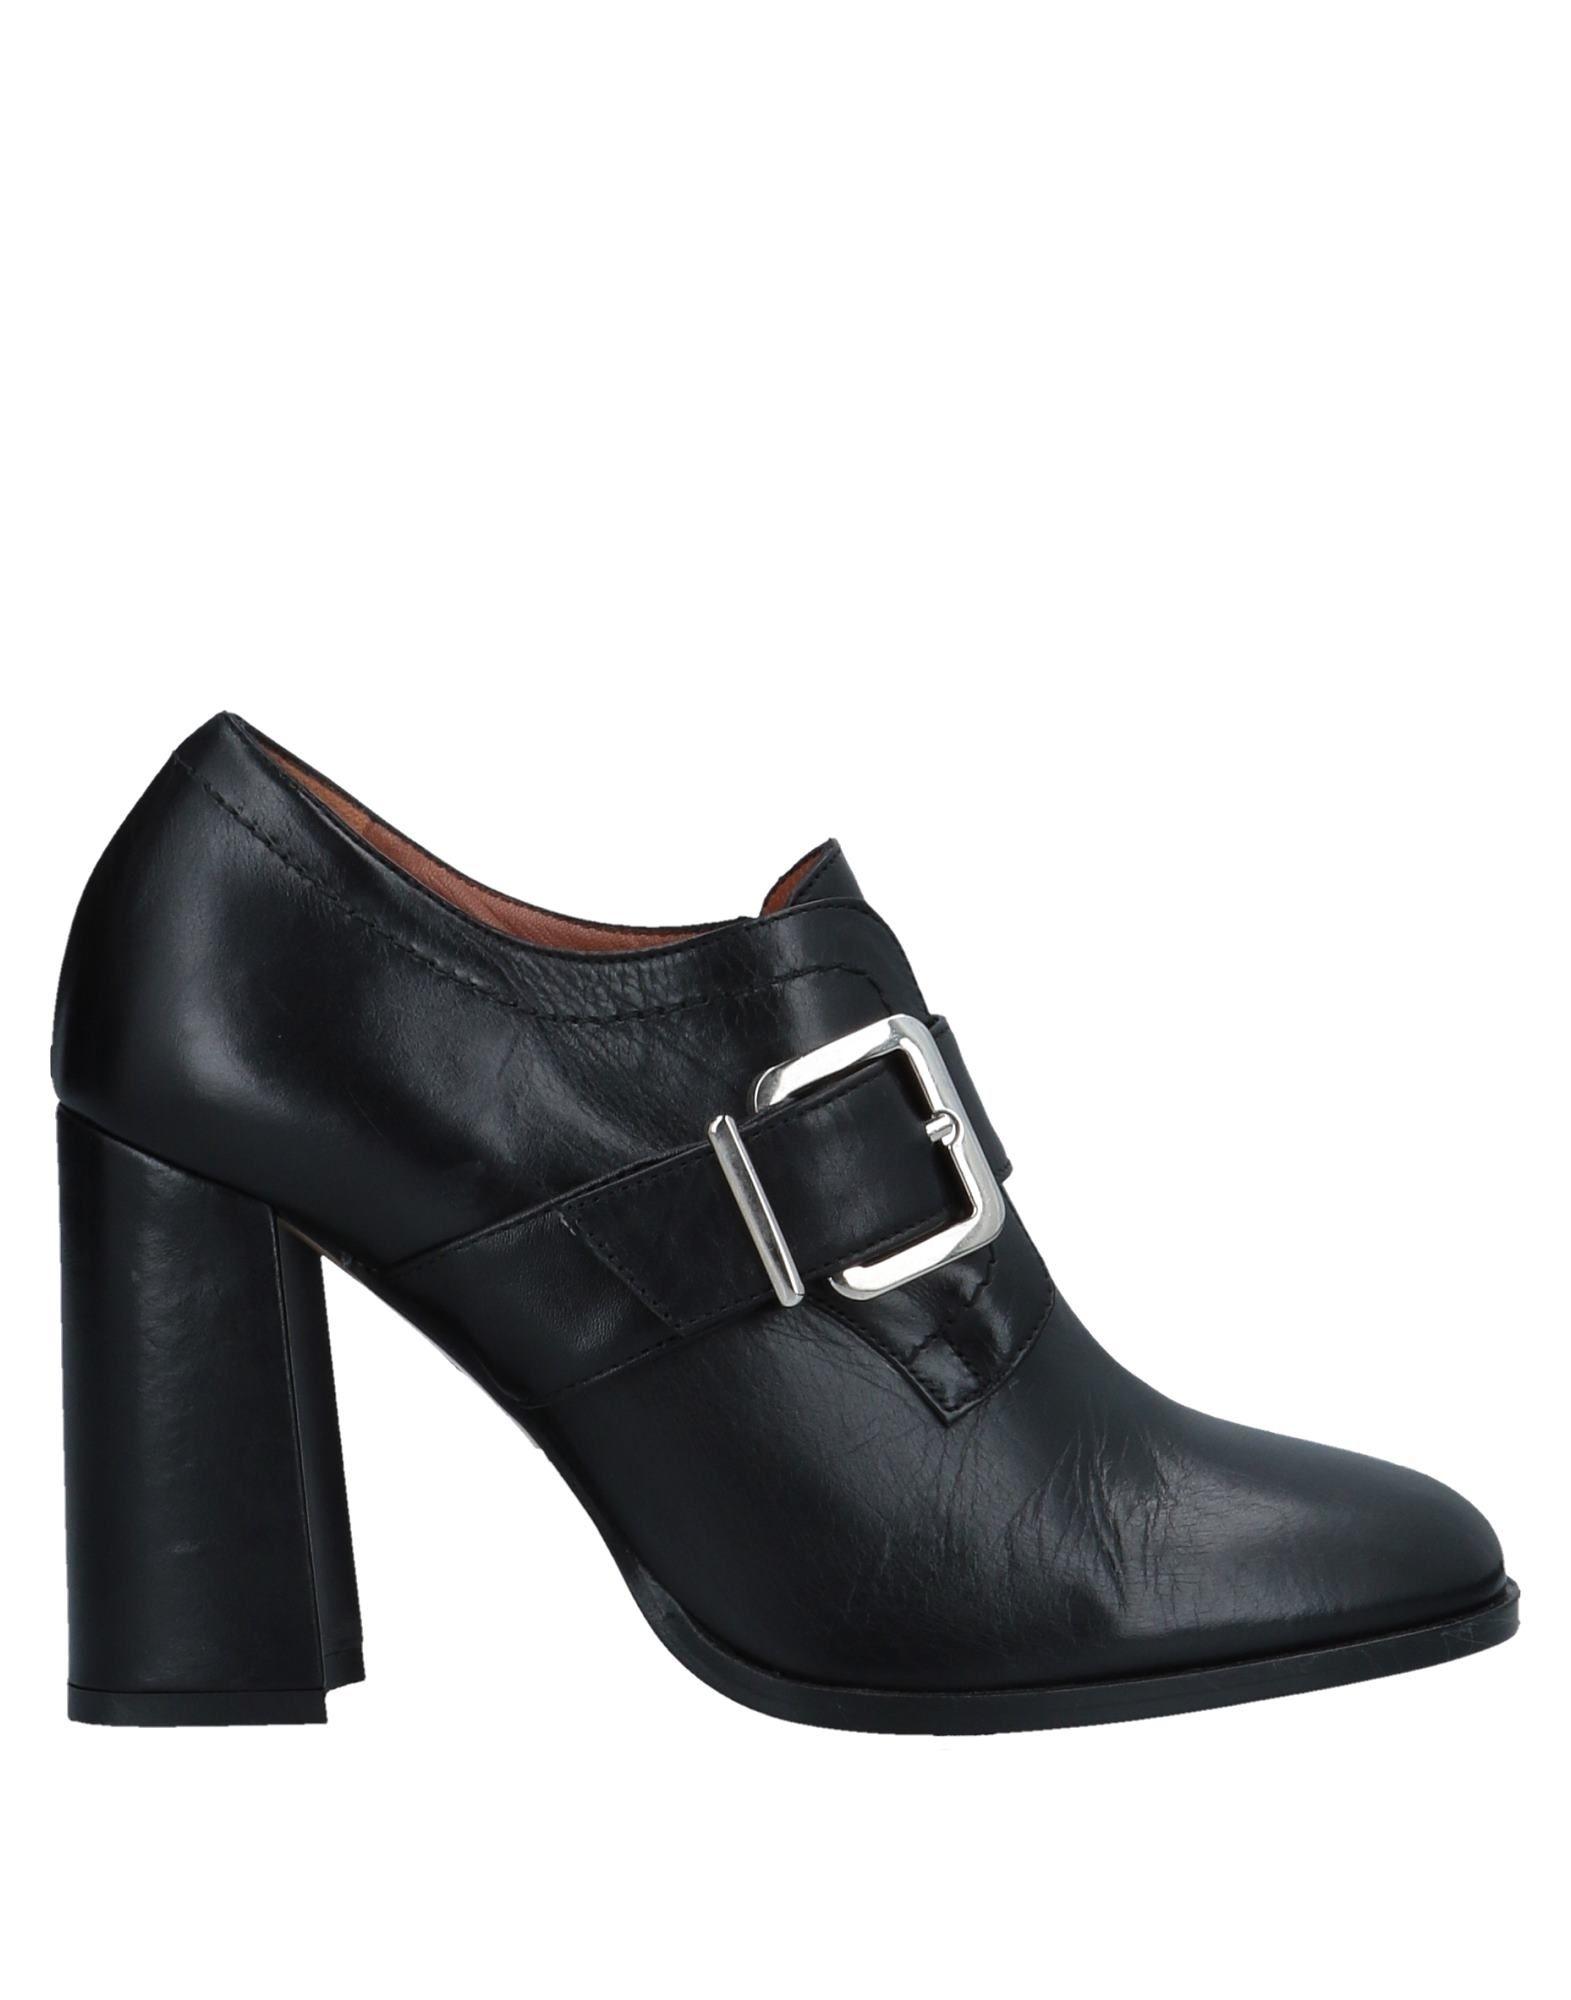 Stilvolle billige Schuhe Damen Matteo Pitti Bologna Stiefelette Damen Schuhe  11520241PK fa45d4